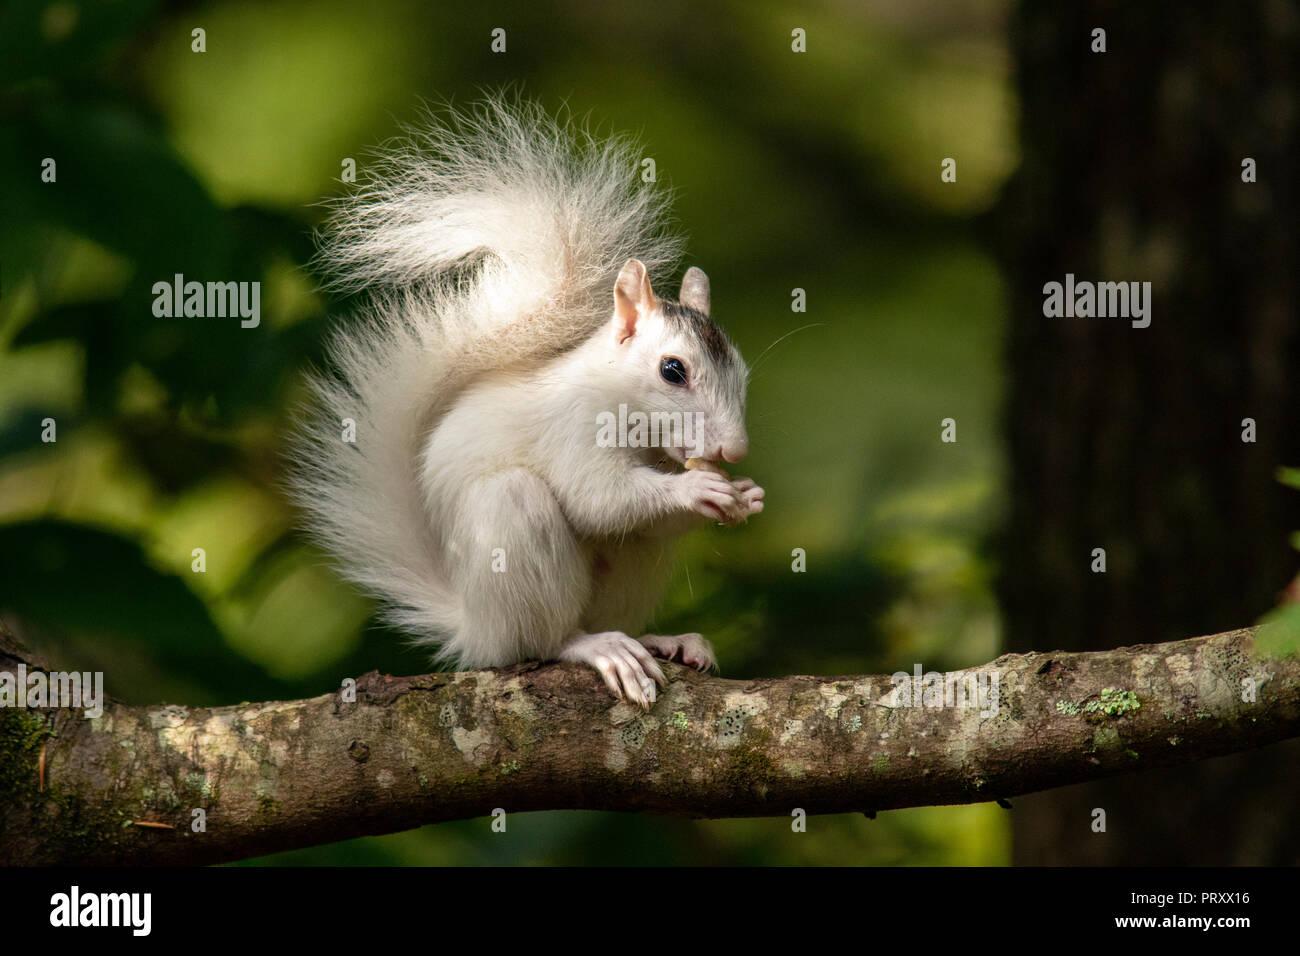 White Squirrel - color variant of Eastern Gray Squirrel (Sciurus carolinensis) - Brevard, North Carolina, USA - Stock Image